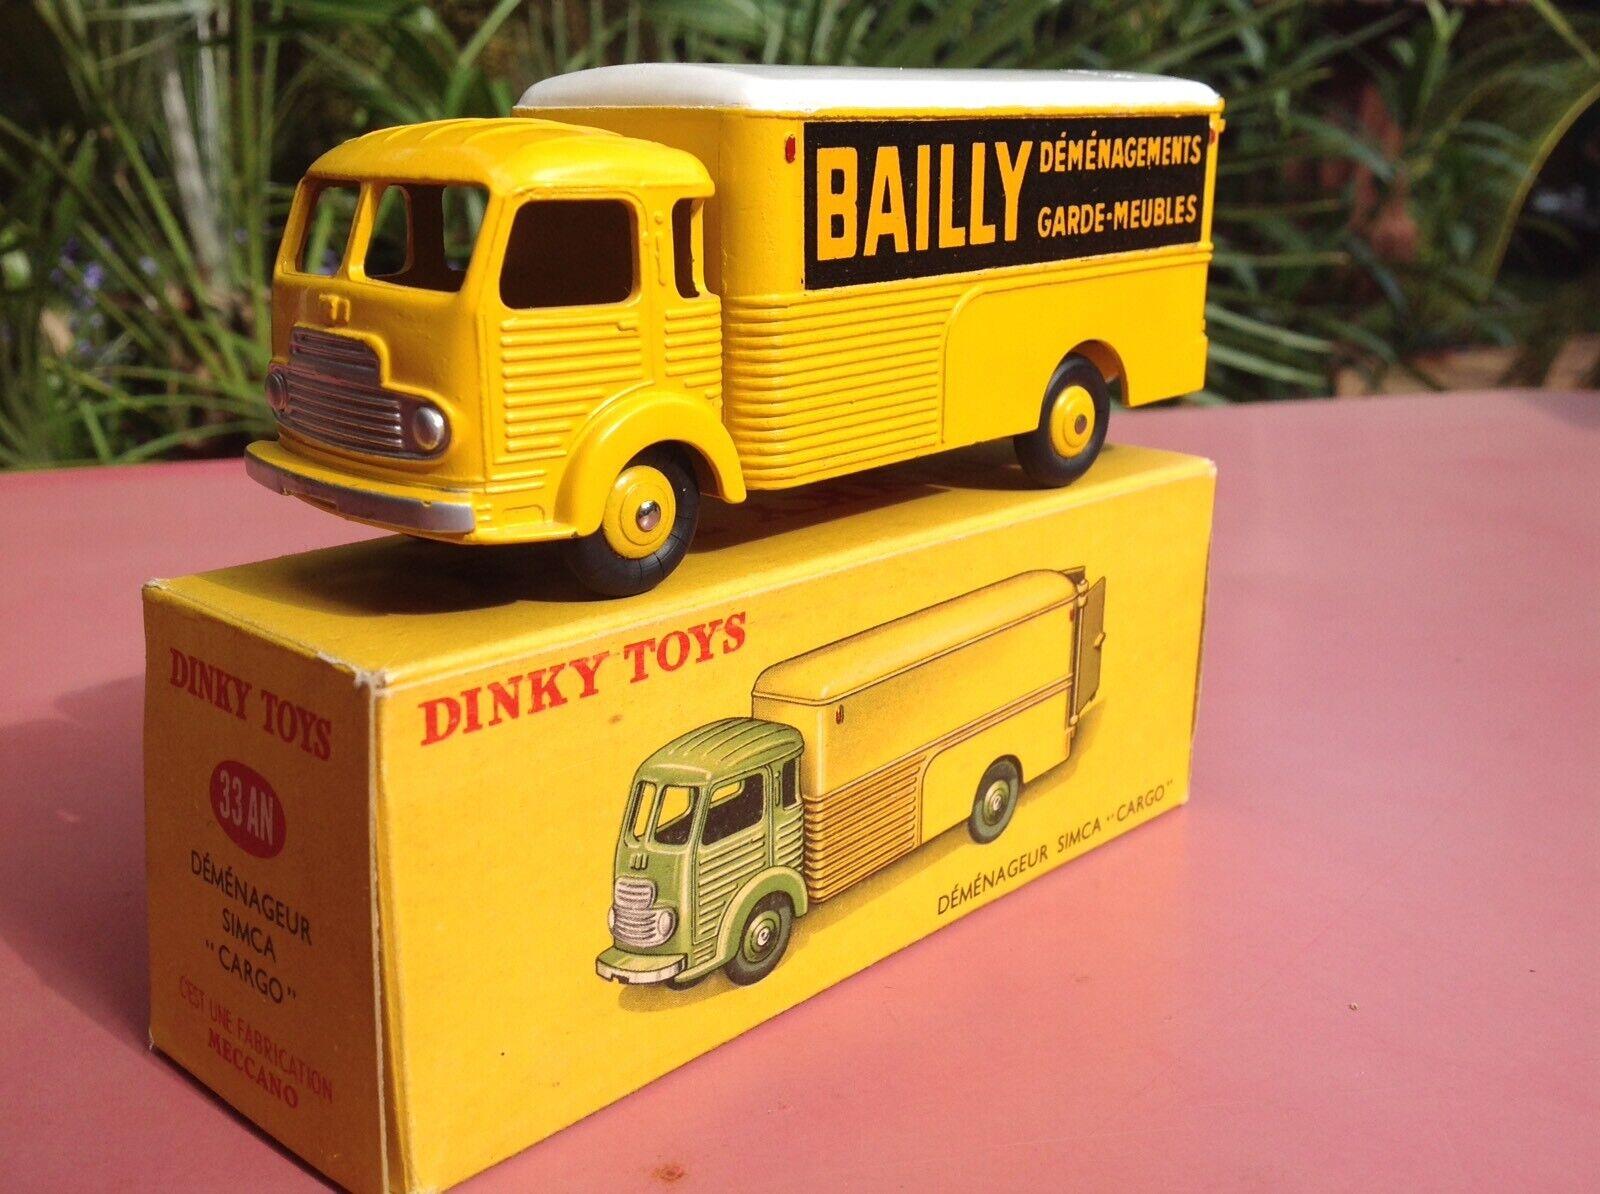 Dinky Toys Réf 33AN Simca Cargo Bailly Mint in box neuf en boite